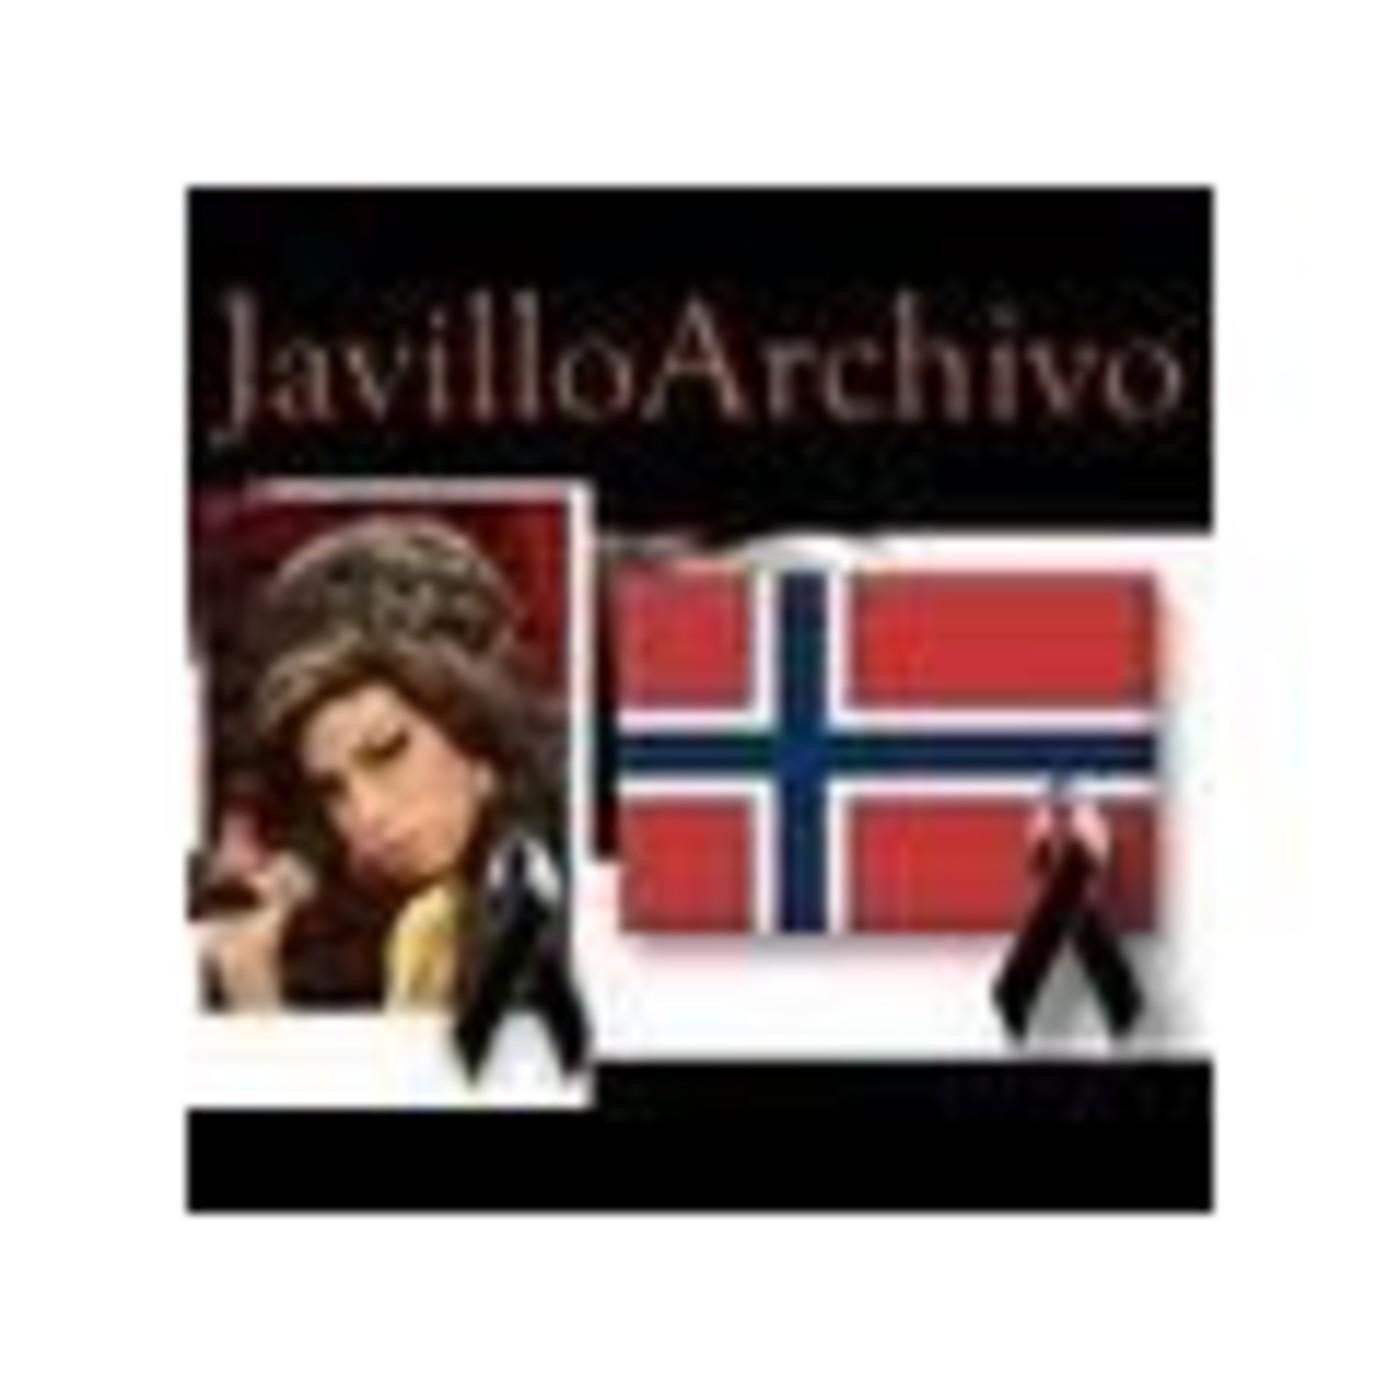 JavilloArchivo